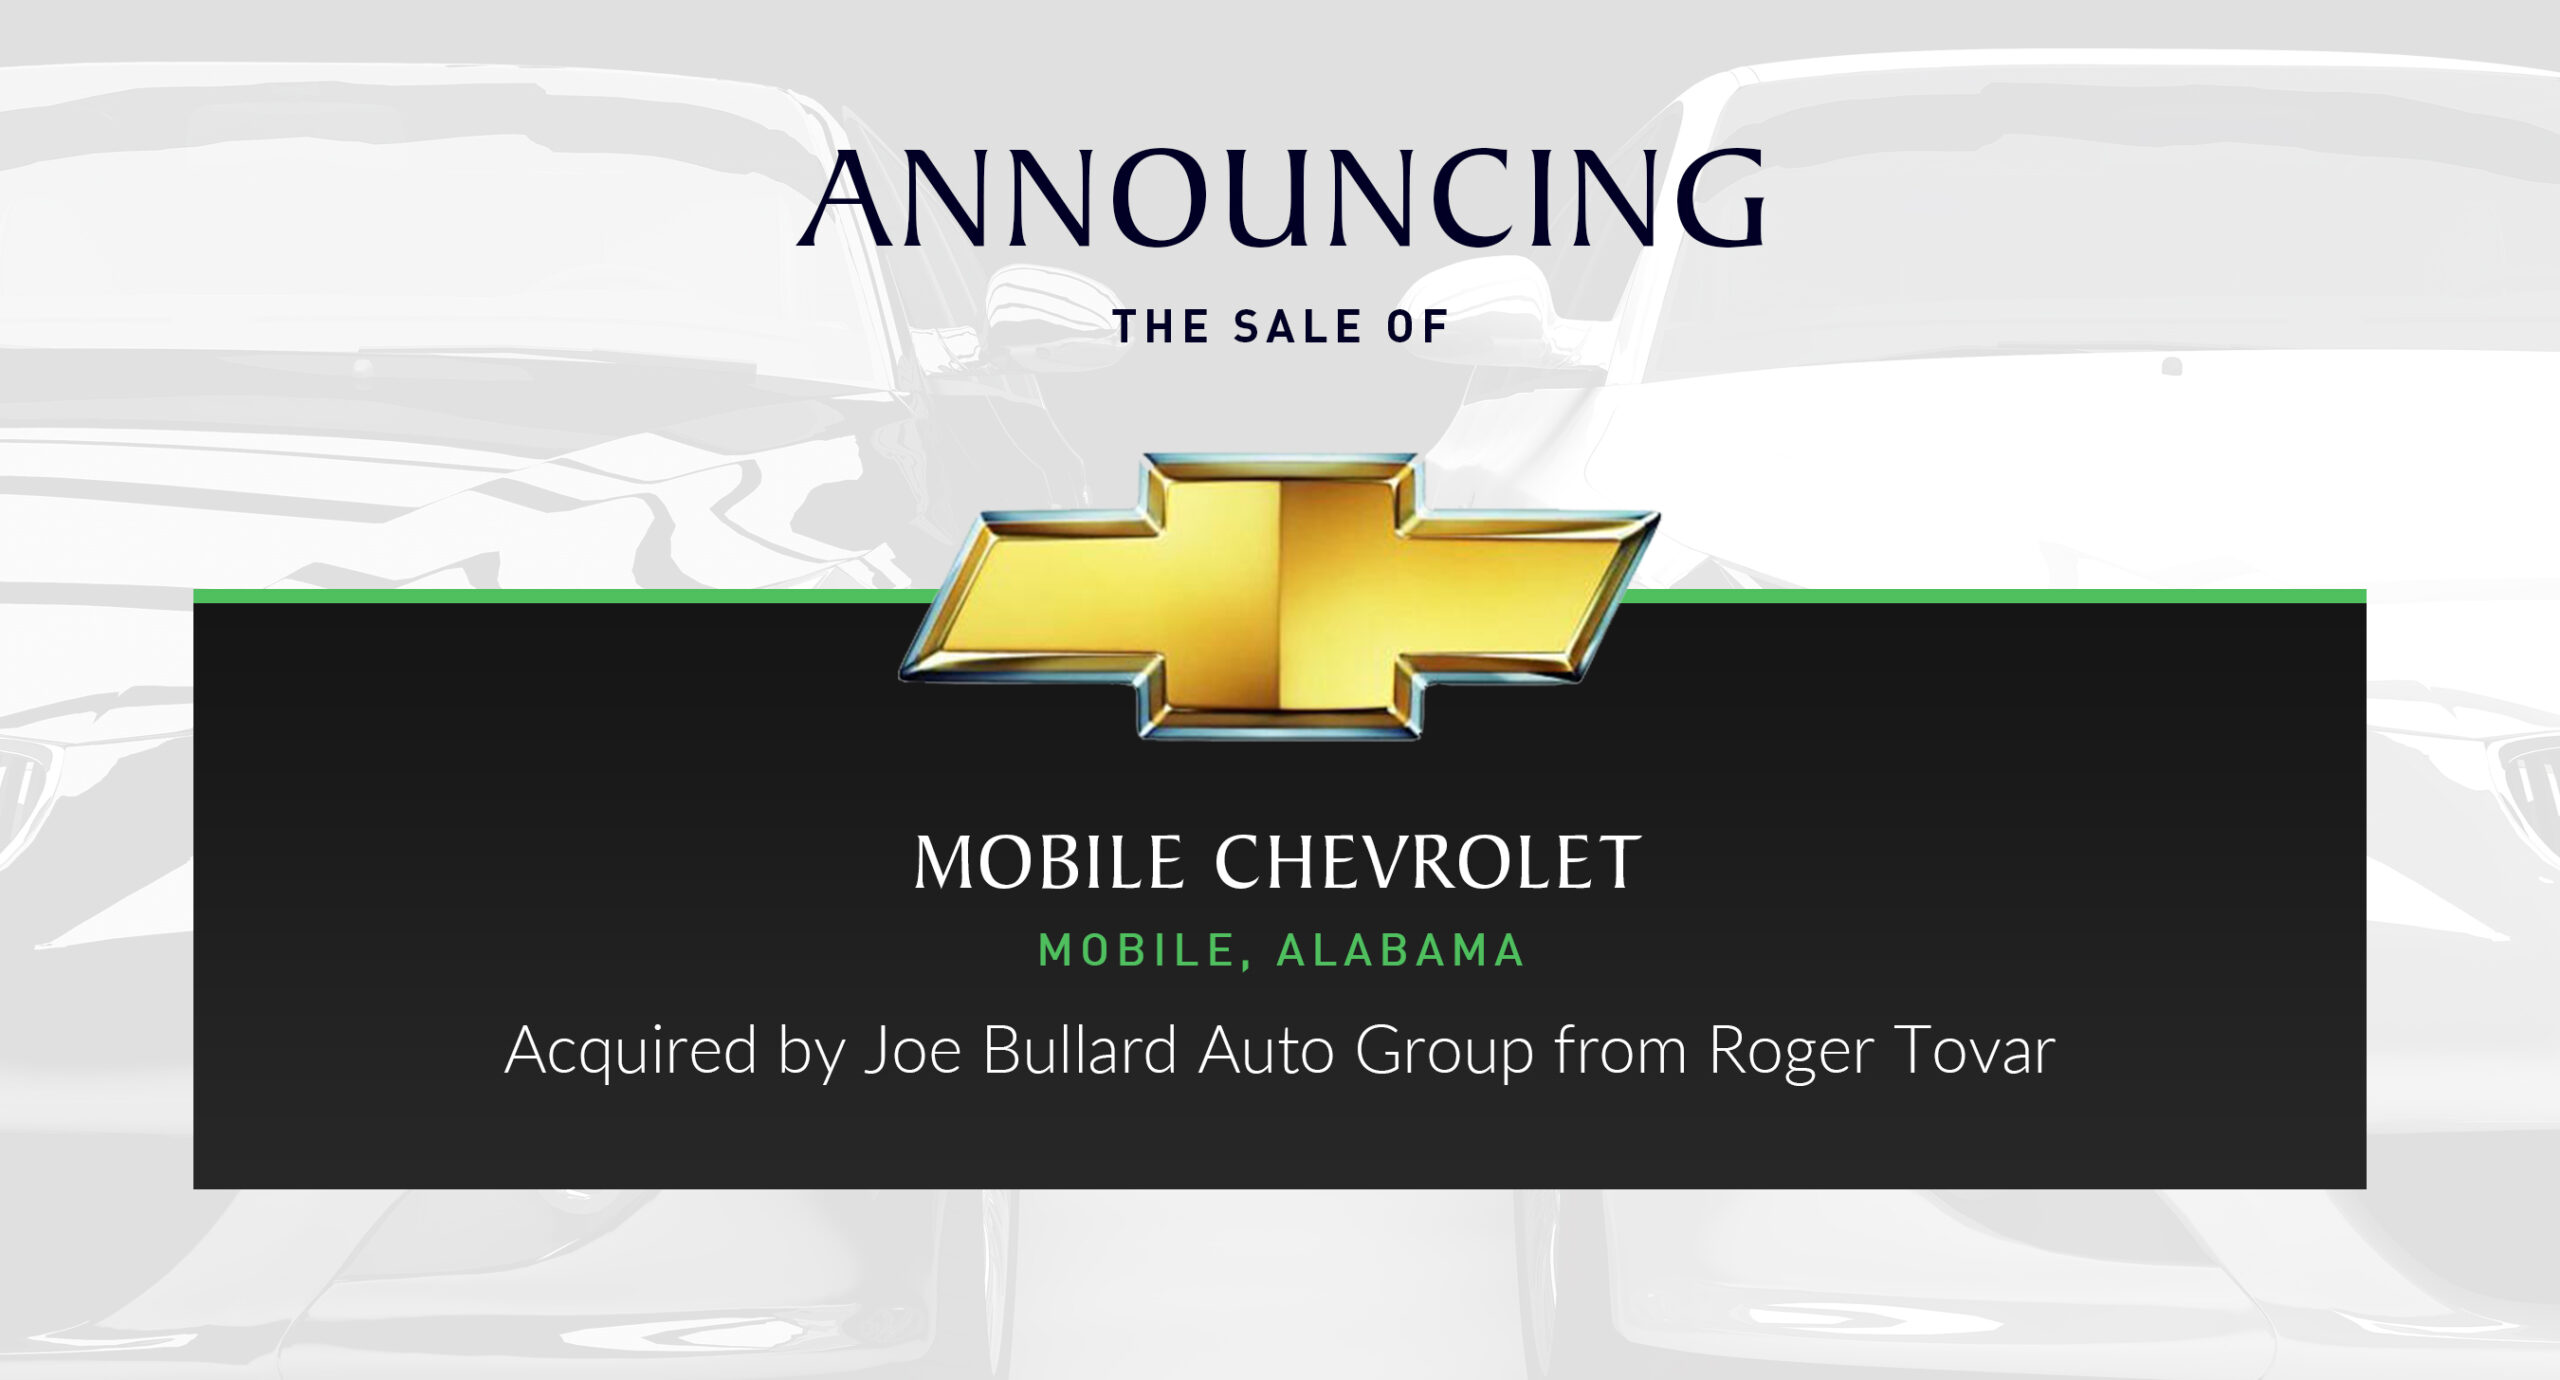 Joe Bullard Auto Group Buys Chevrolet In Mobile Alabama Performance Brokerage Services